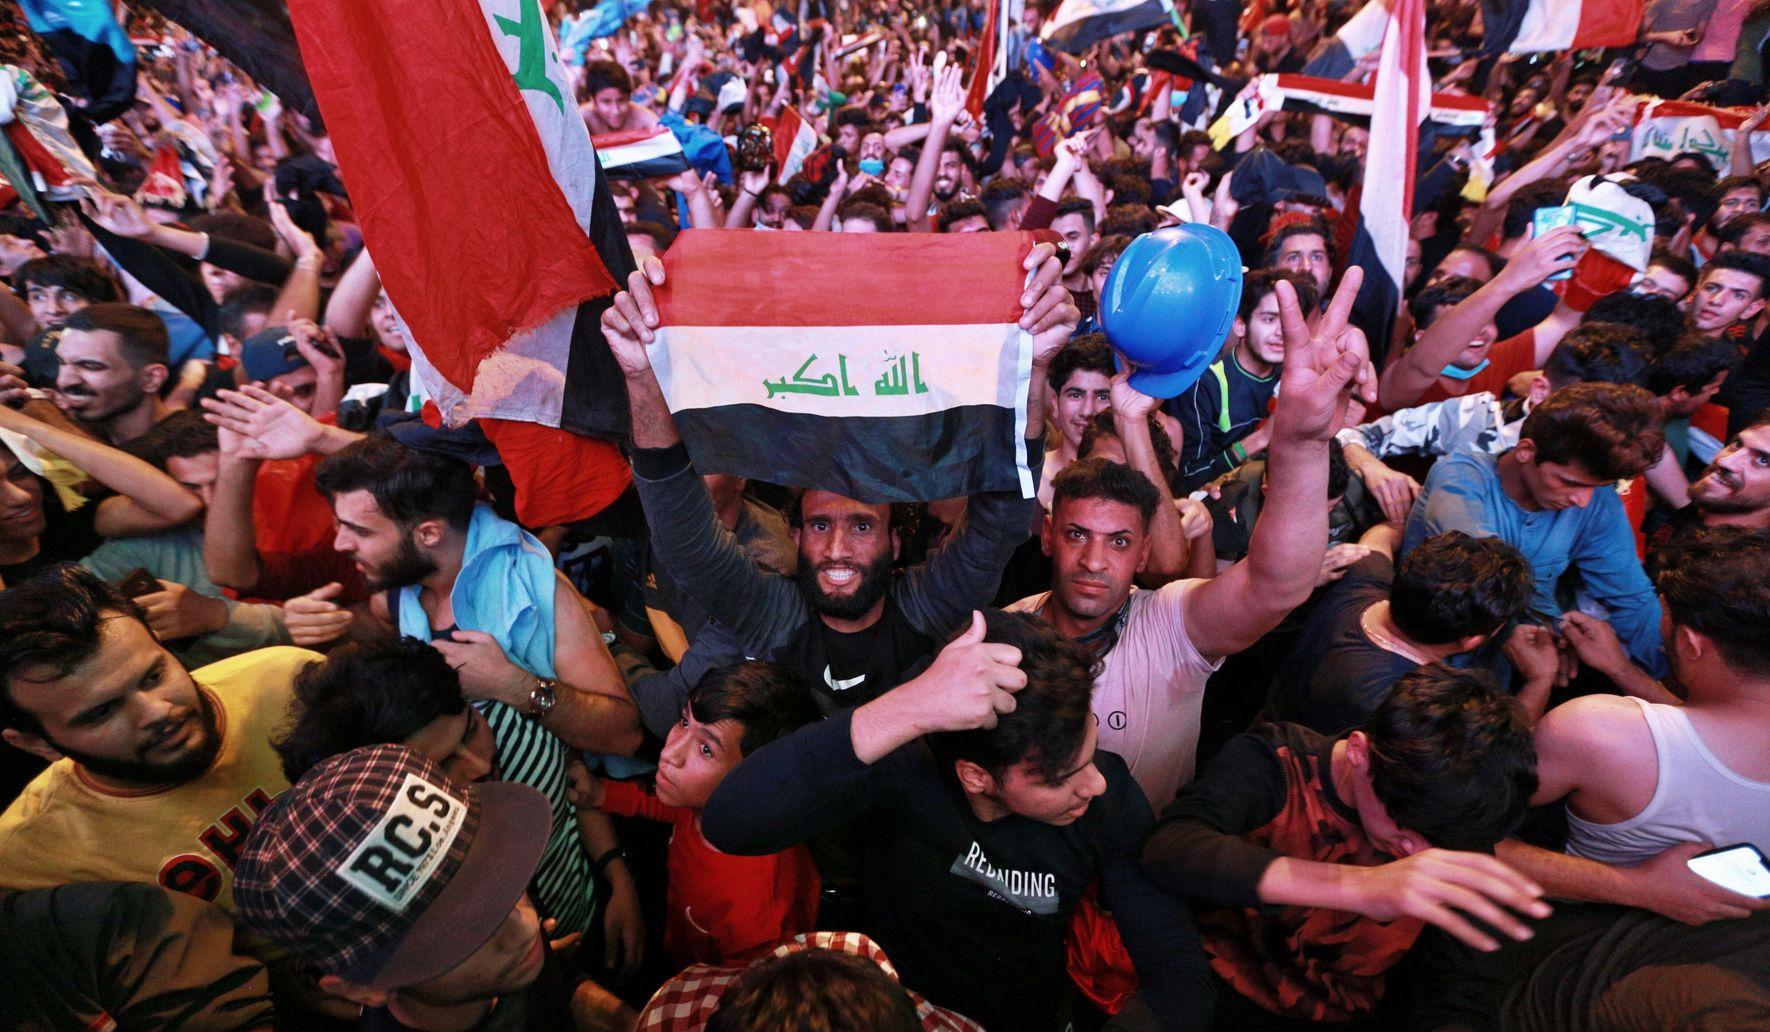 Iraq_protests_54595_c0-241-5760-3599_s1770x1032